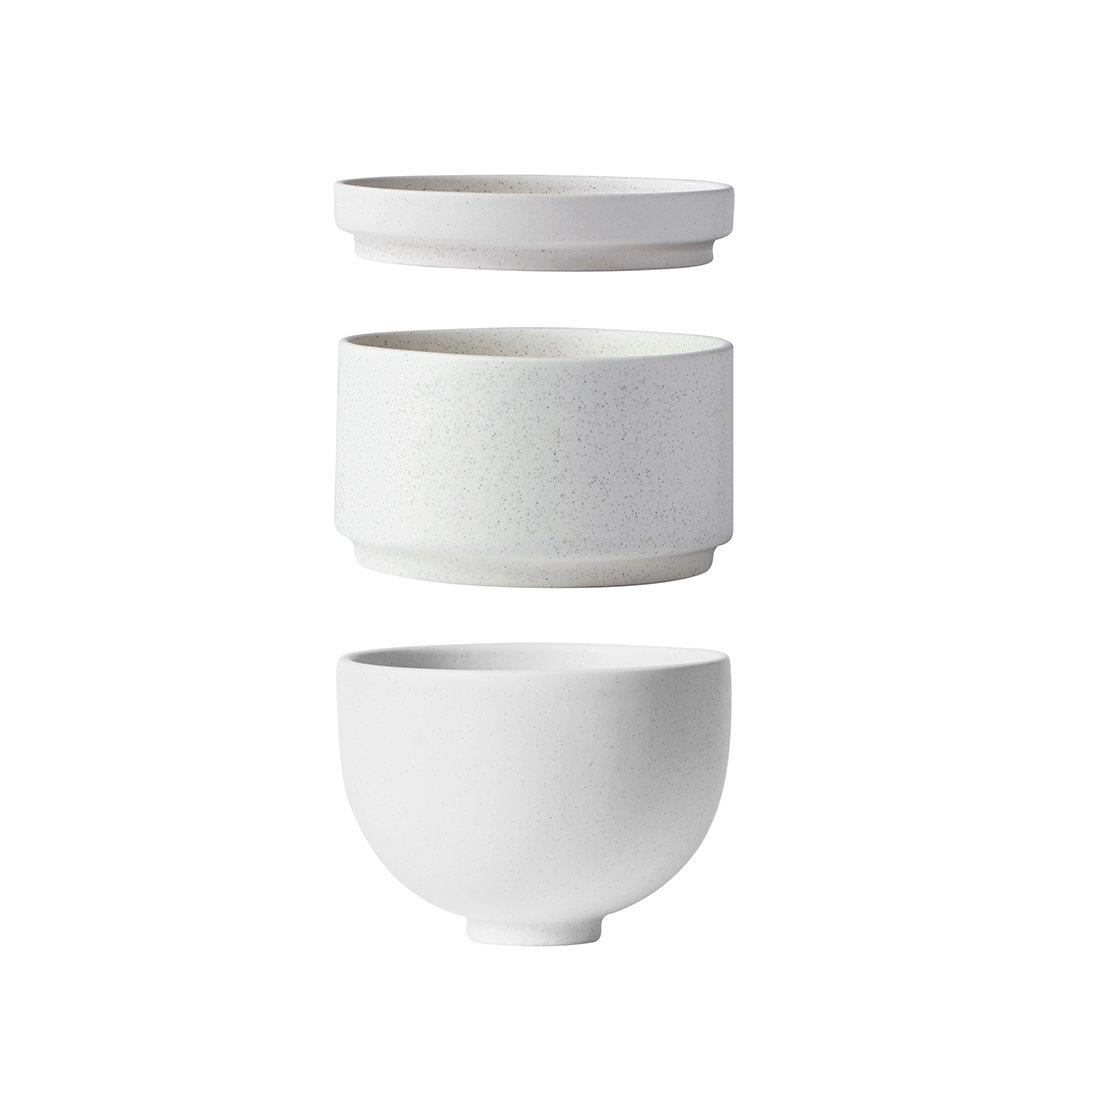 Setomono bowl set small Kristina dam Studio